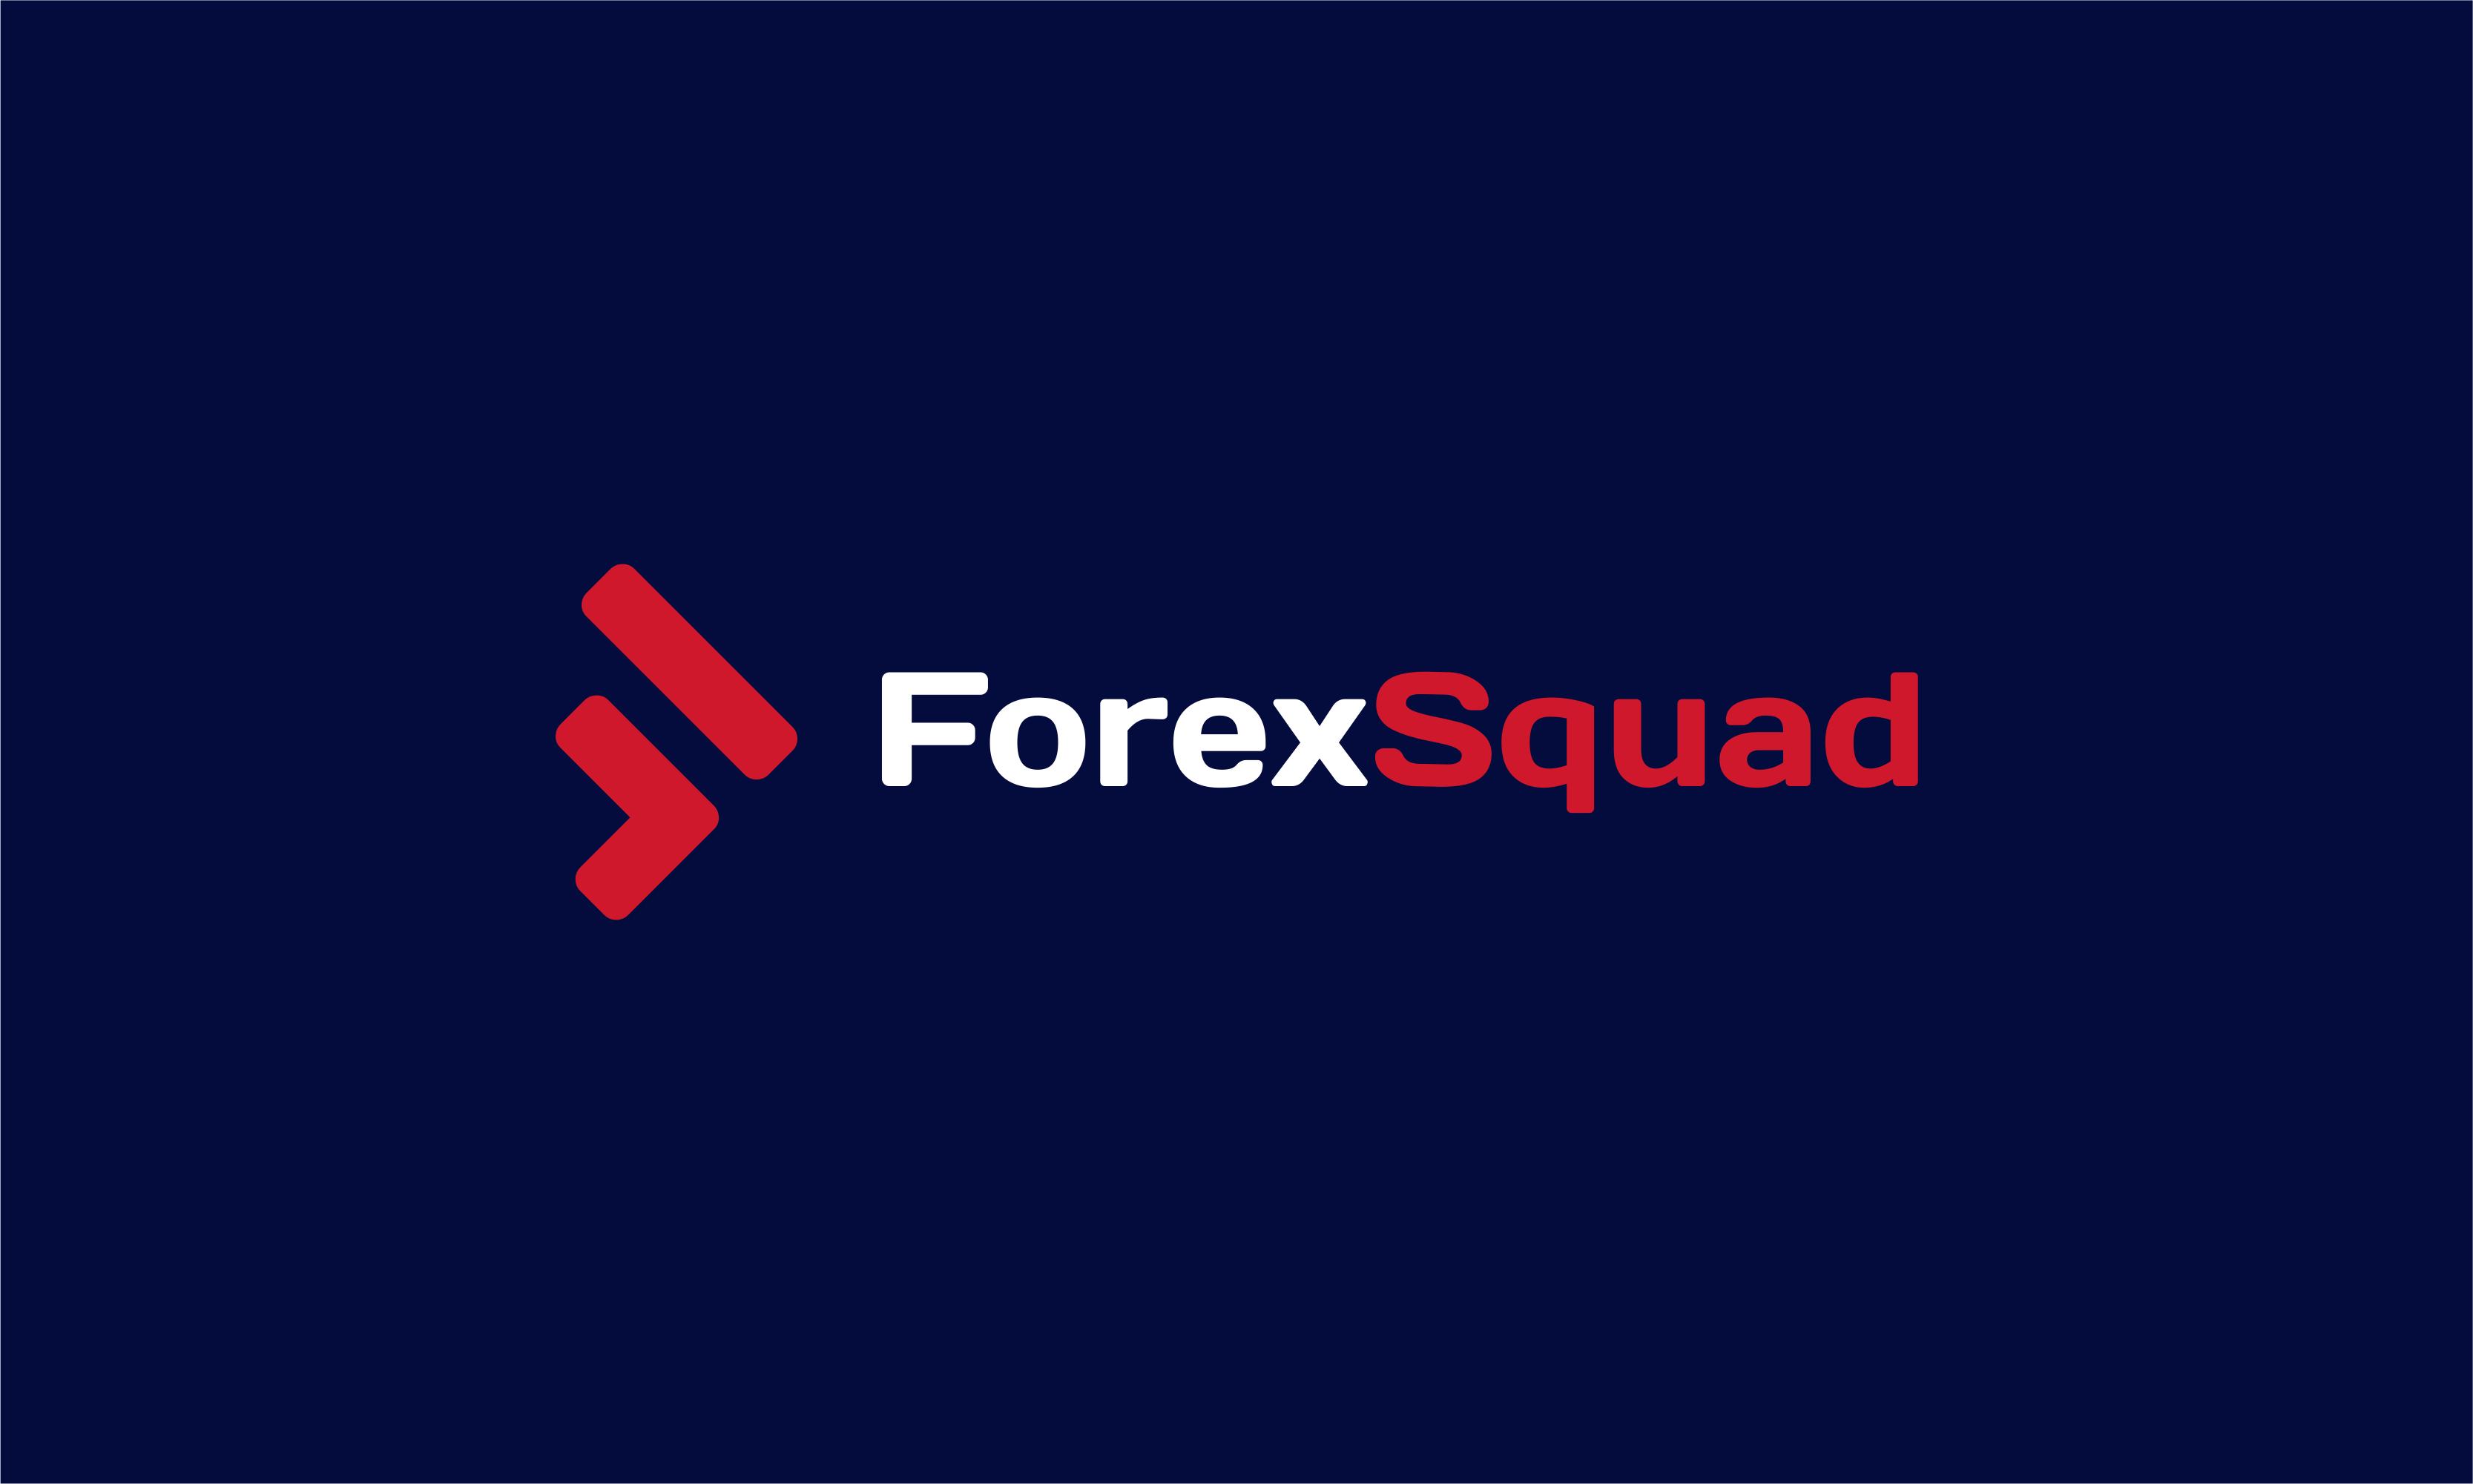 Forexsquad